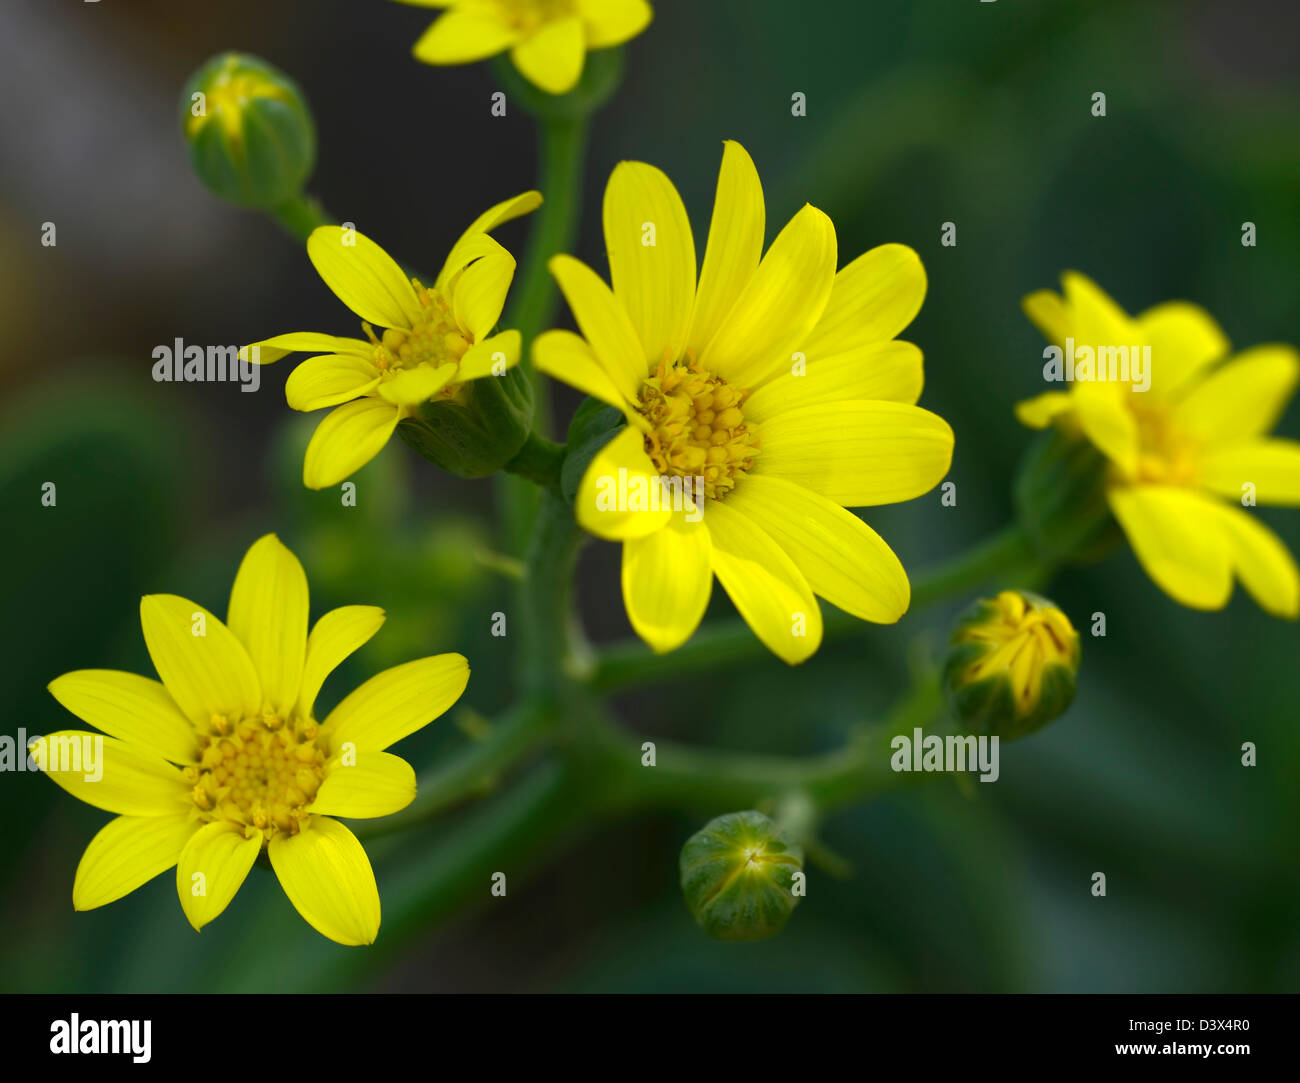 Yellow Daisy Like Flowers Stock Photos Yellow Daisy Like Flowers